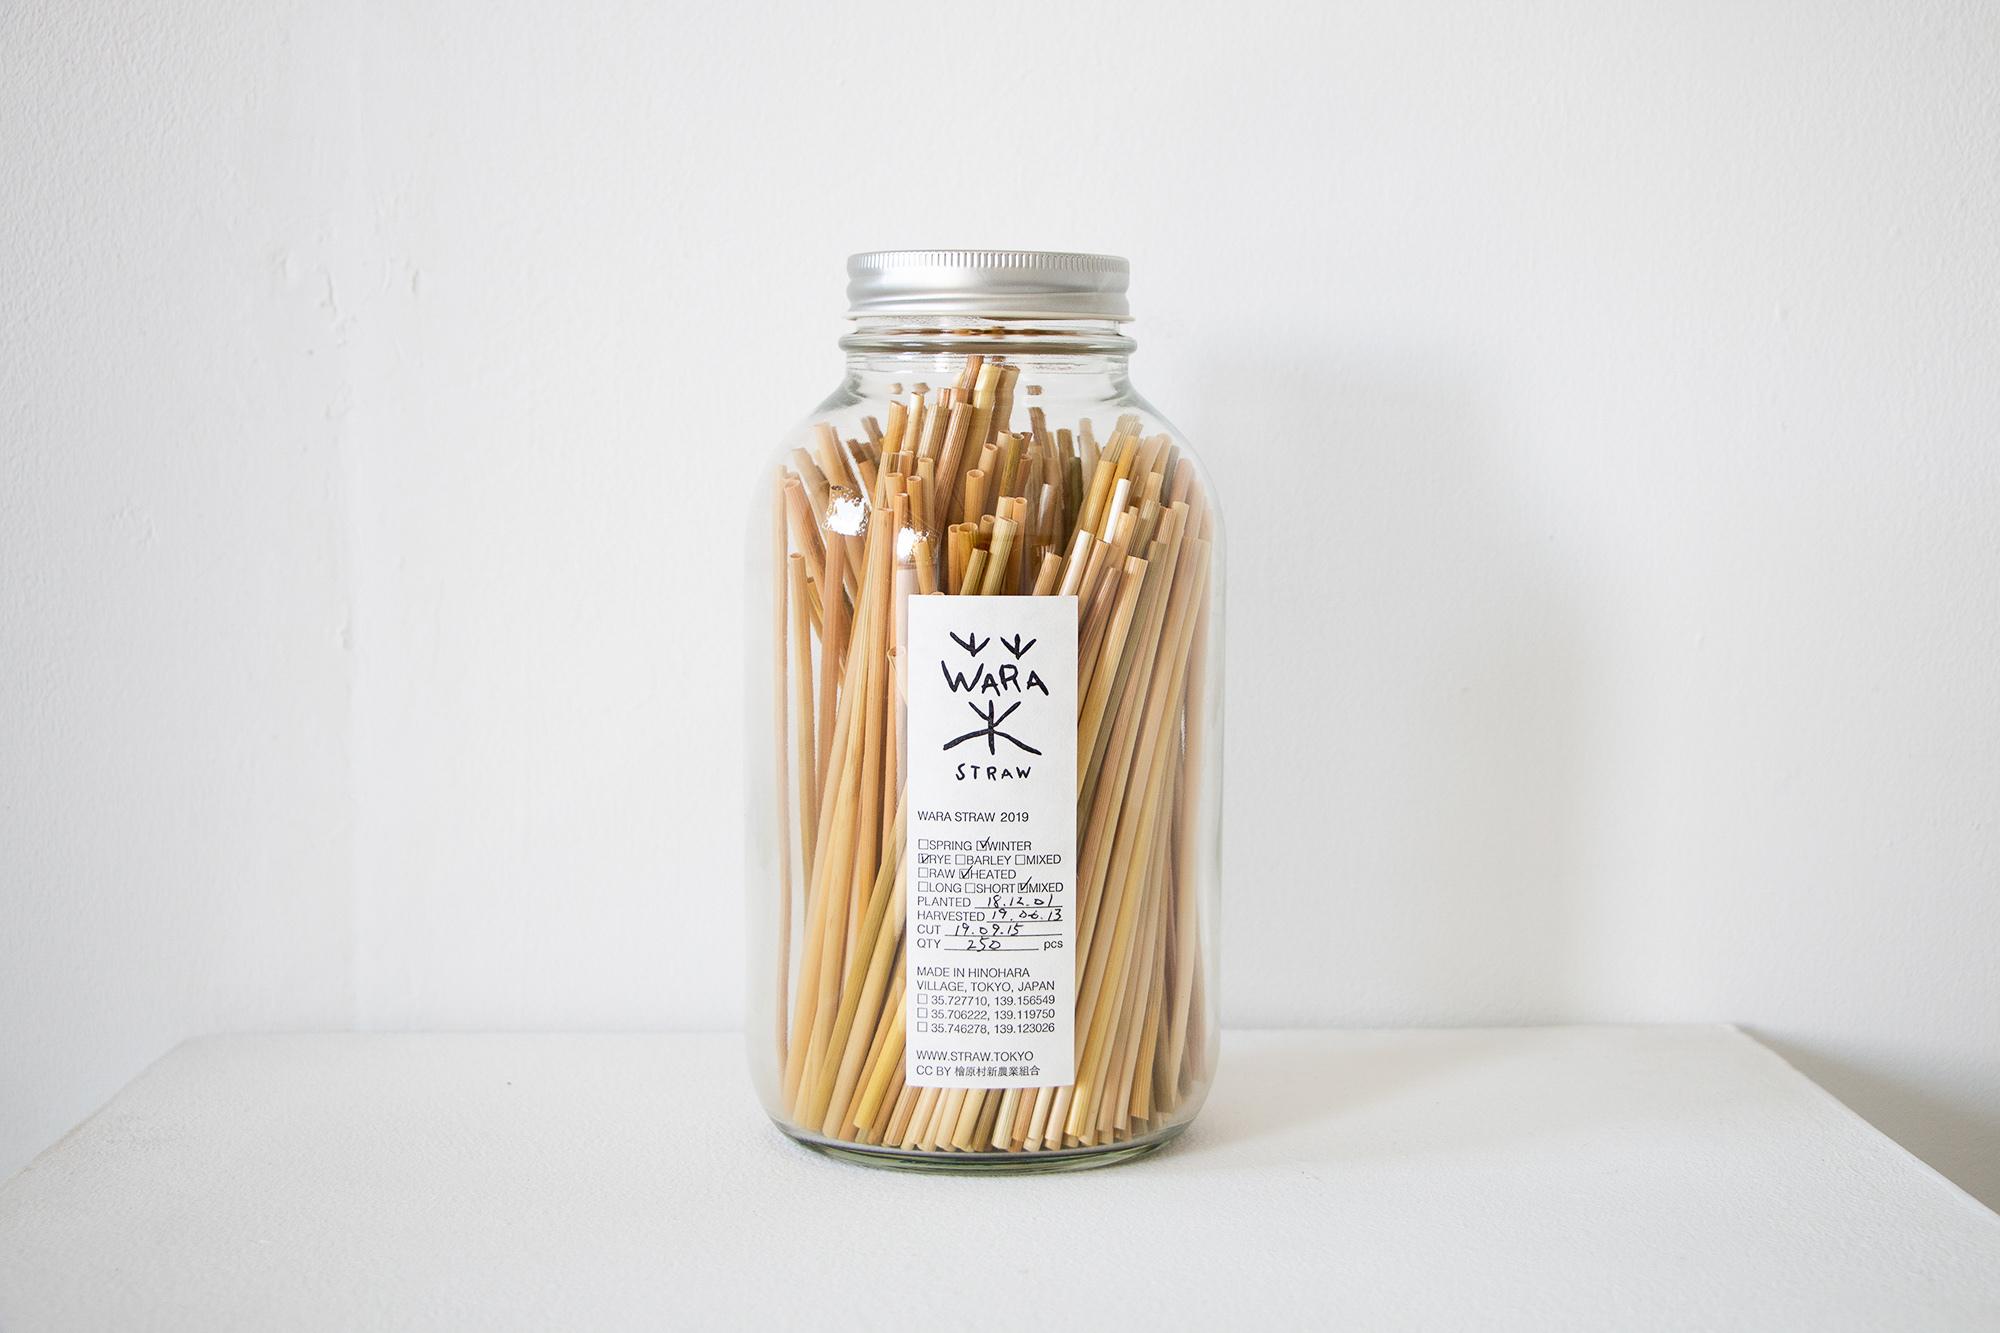 Wara Straw